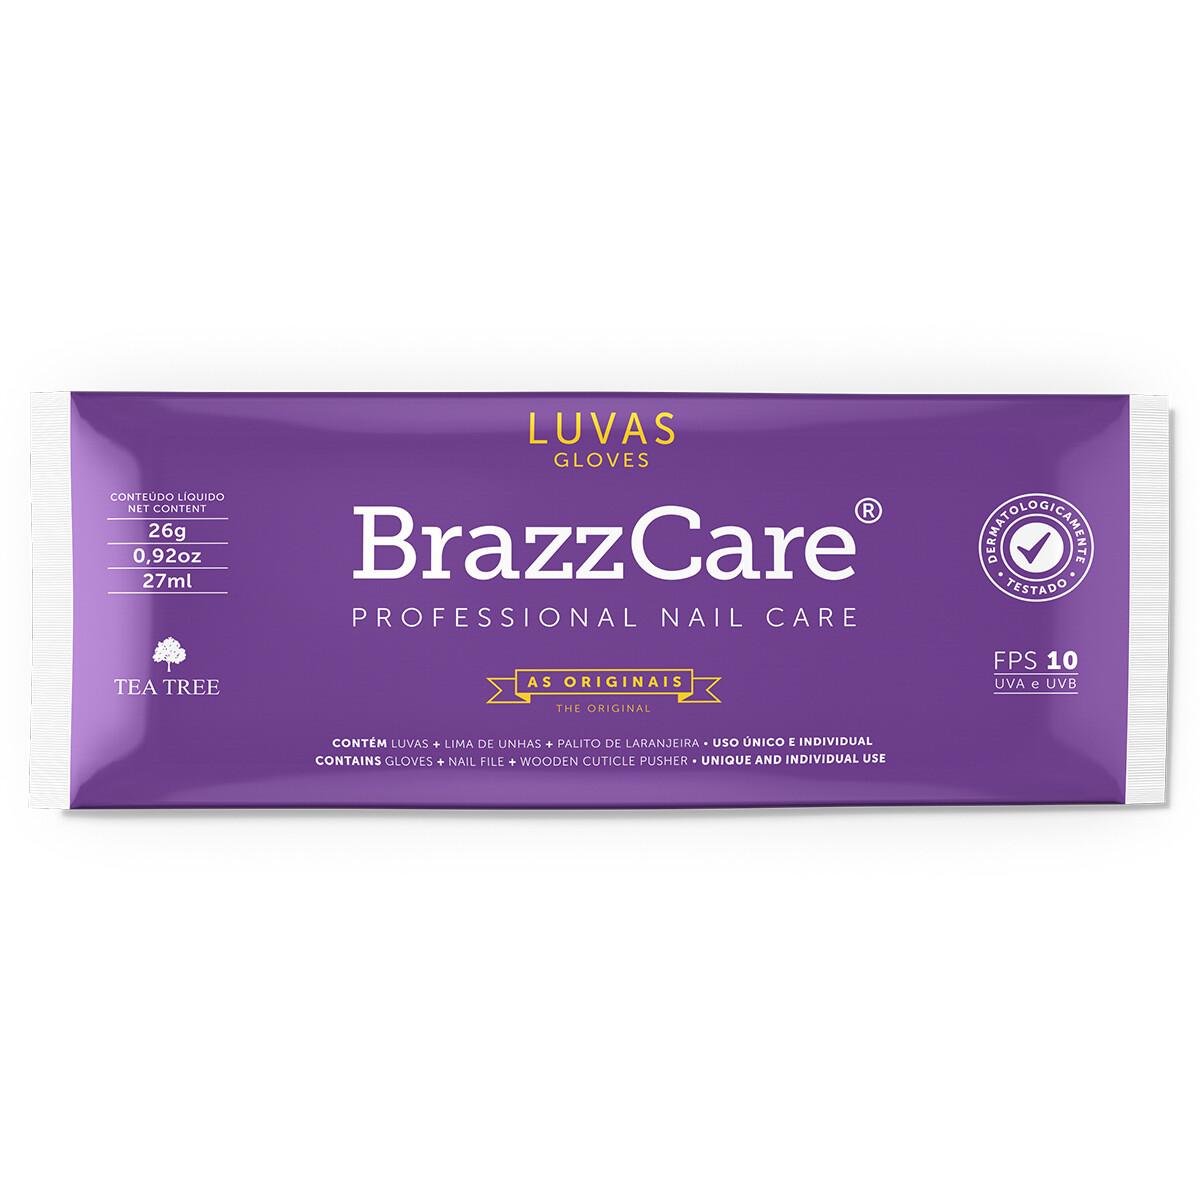 Перчатки для бразильского маникюра BrazzCare